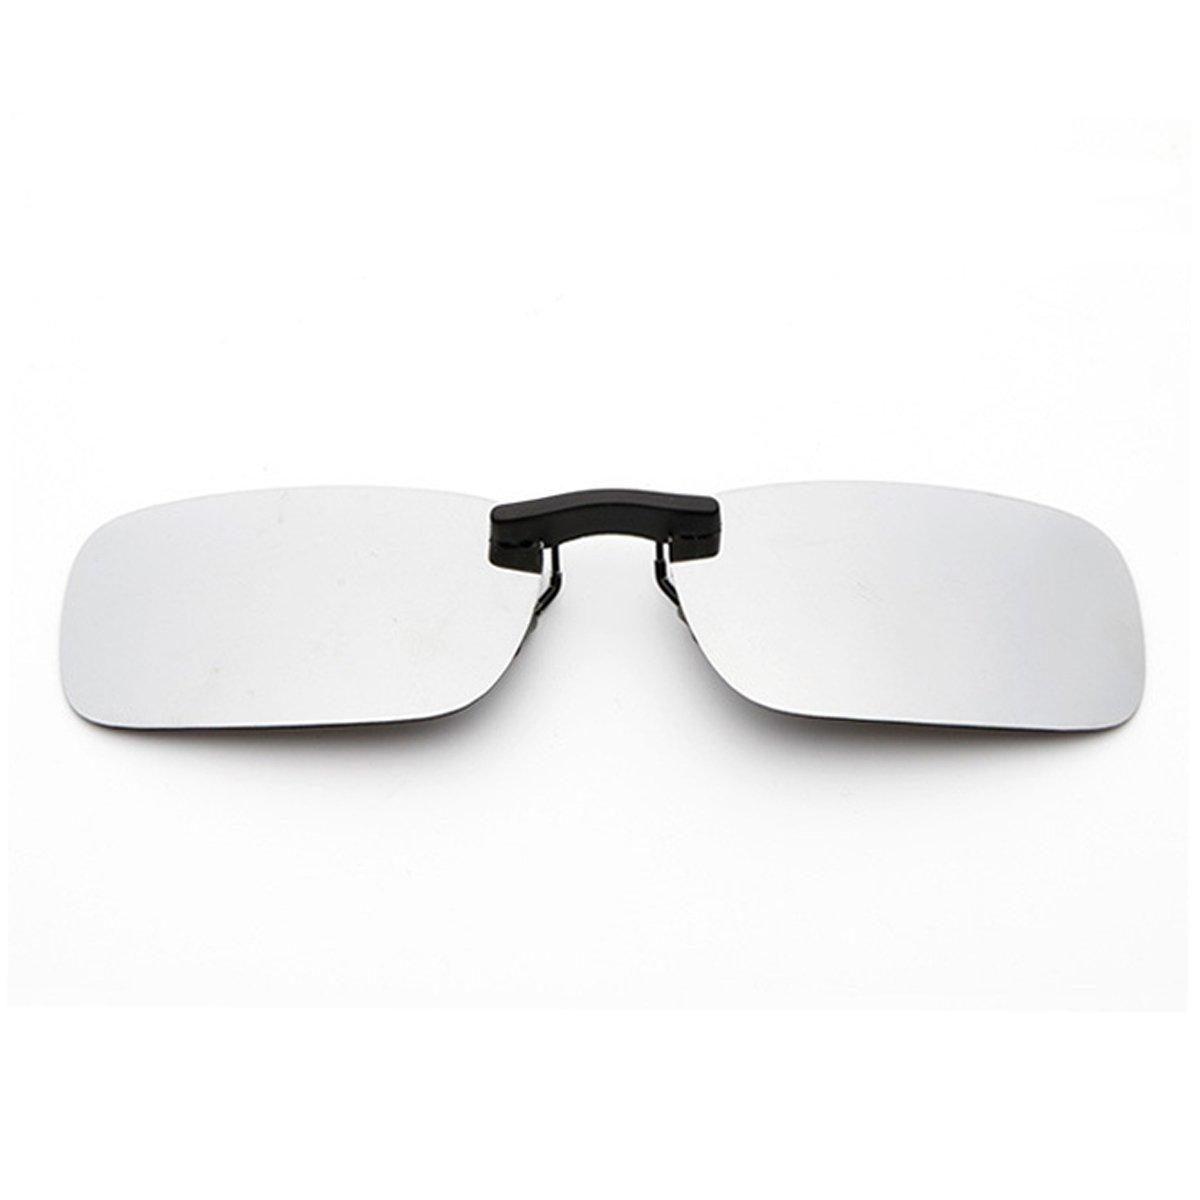 2aef4de668e Clip On Sunglasses Men s Titanium Flexible Polarized Lenses Glasses Laura  Fairy 55)